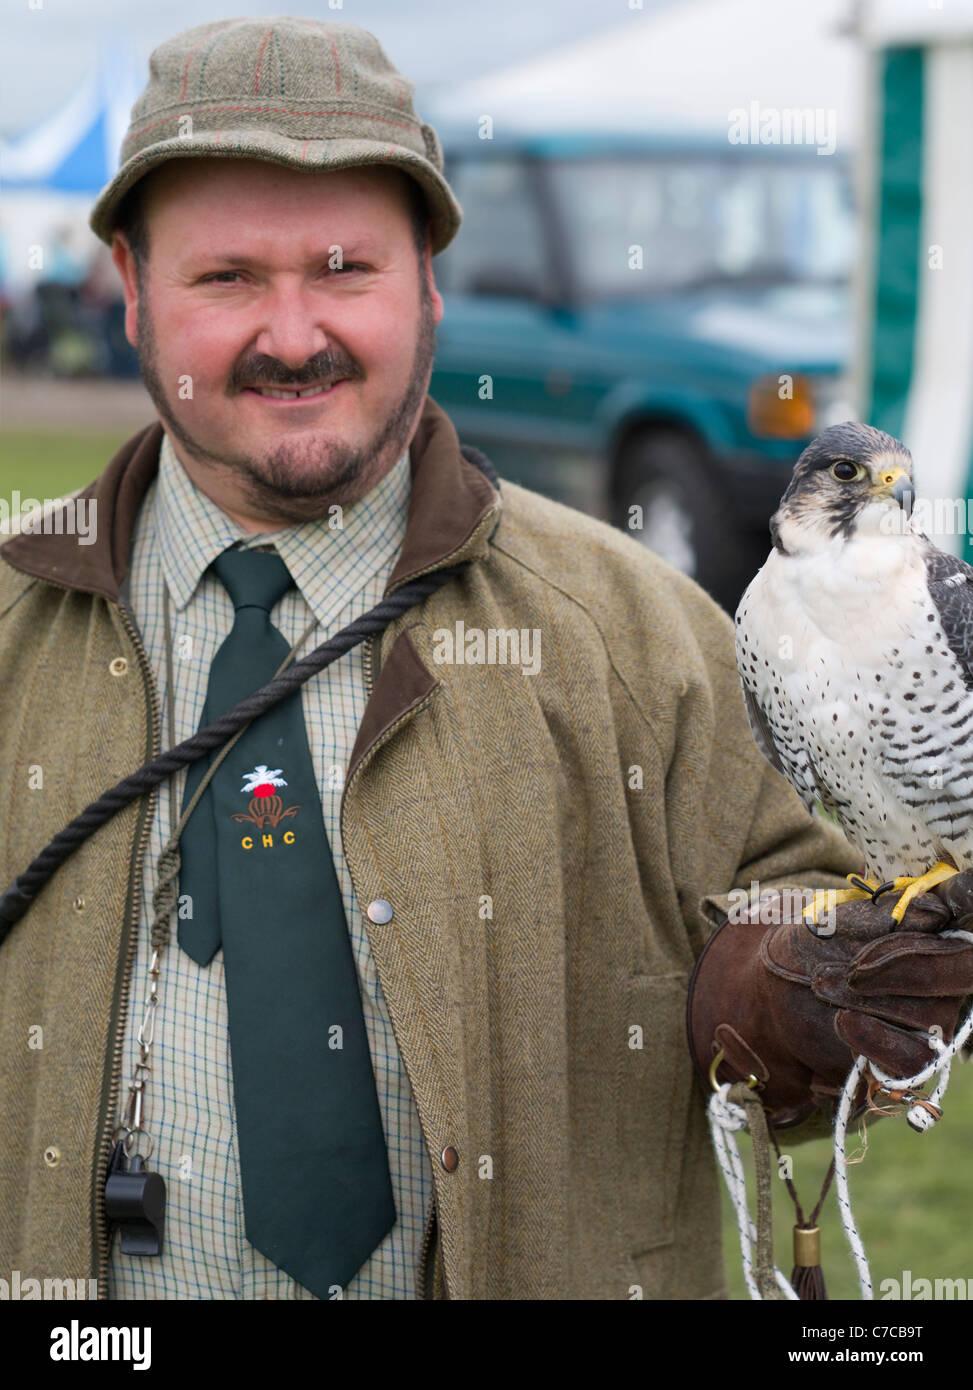 Cheshire Game & Country Fair - Falconry  Falconer: RICHARD NEWTON Bird: White Gyr Falcon x Peregrine Falcon - Stock Image